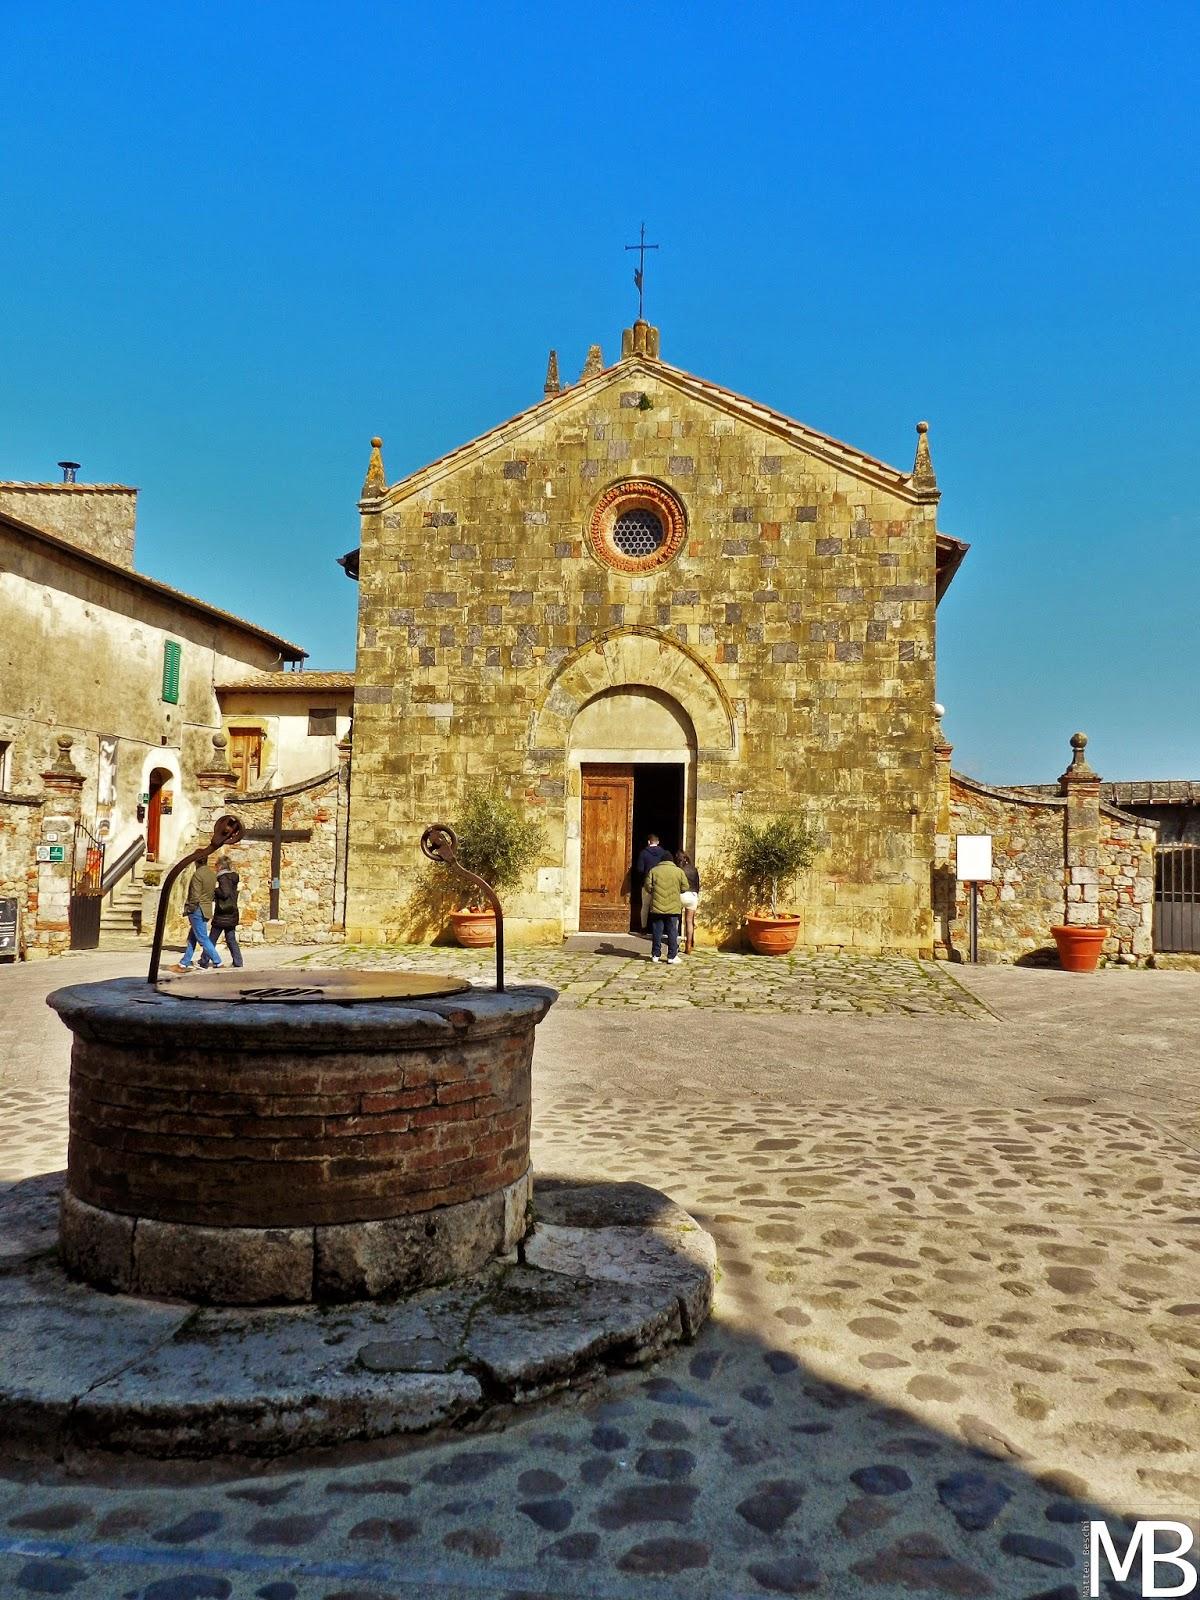 Toscana on the road siena e dintorni - Ristorante da divo siena ...